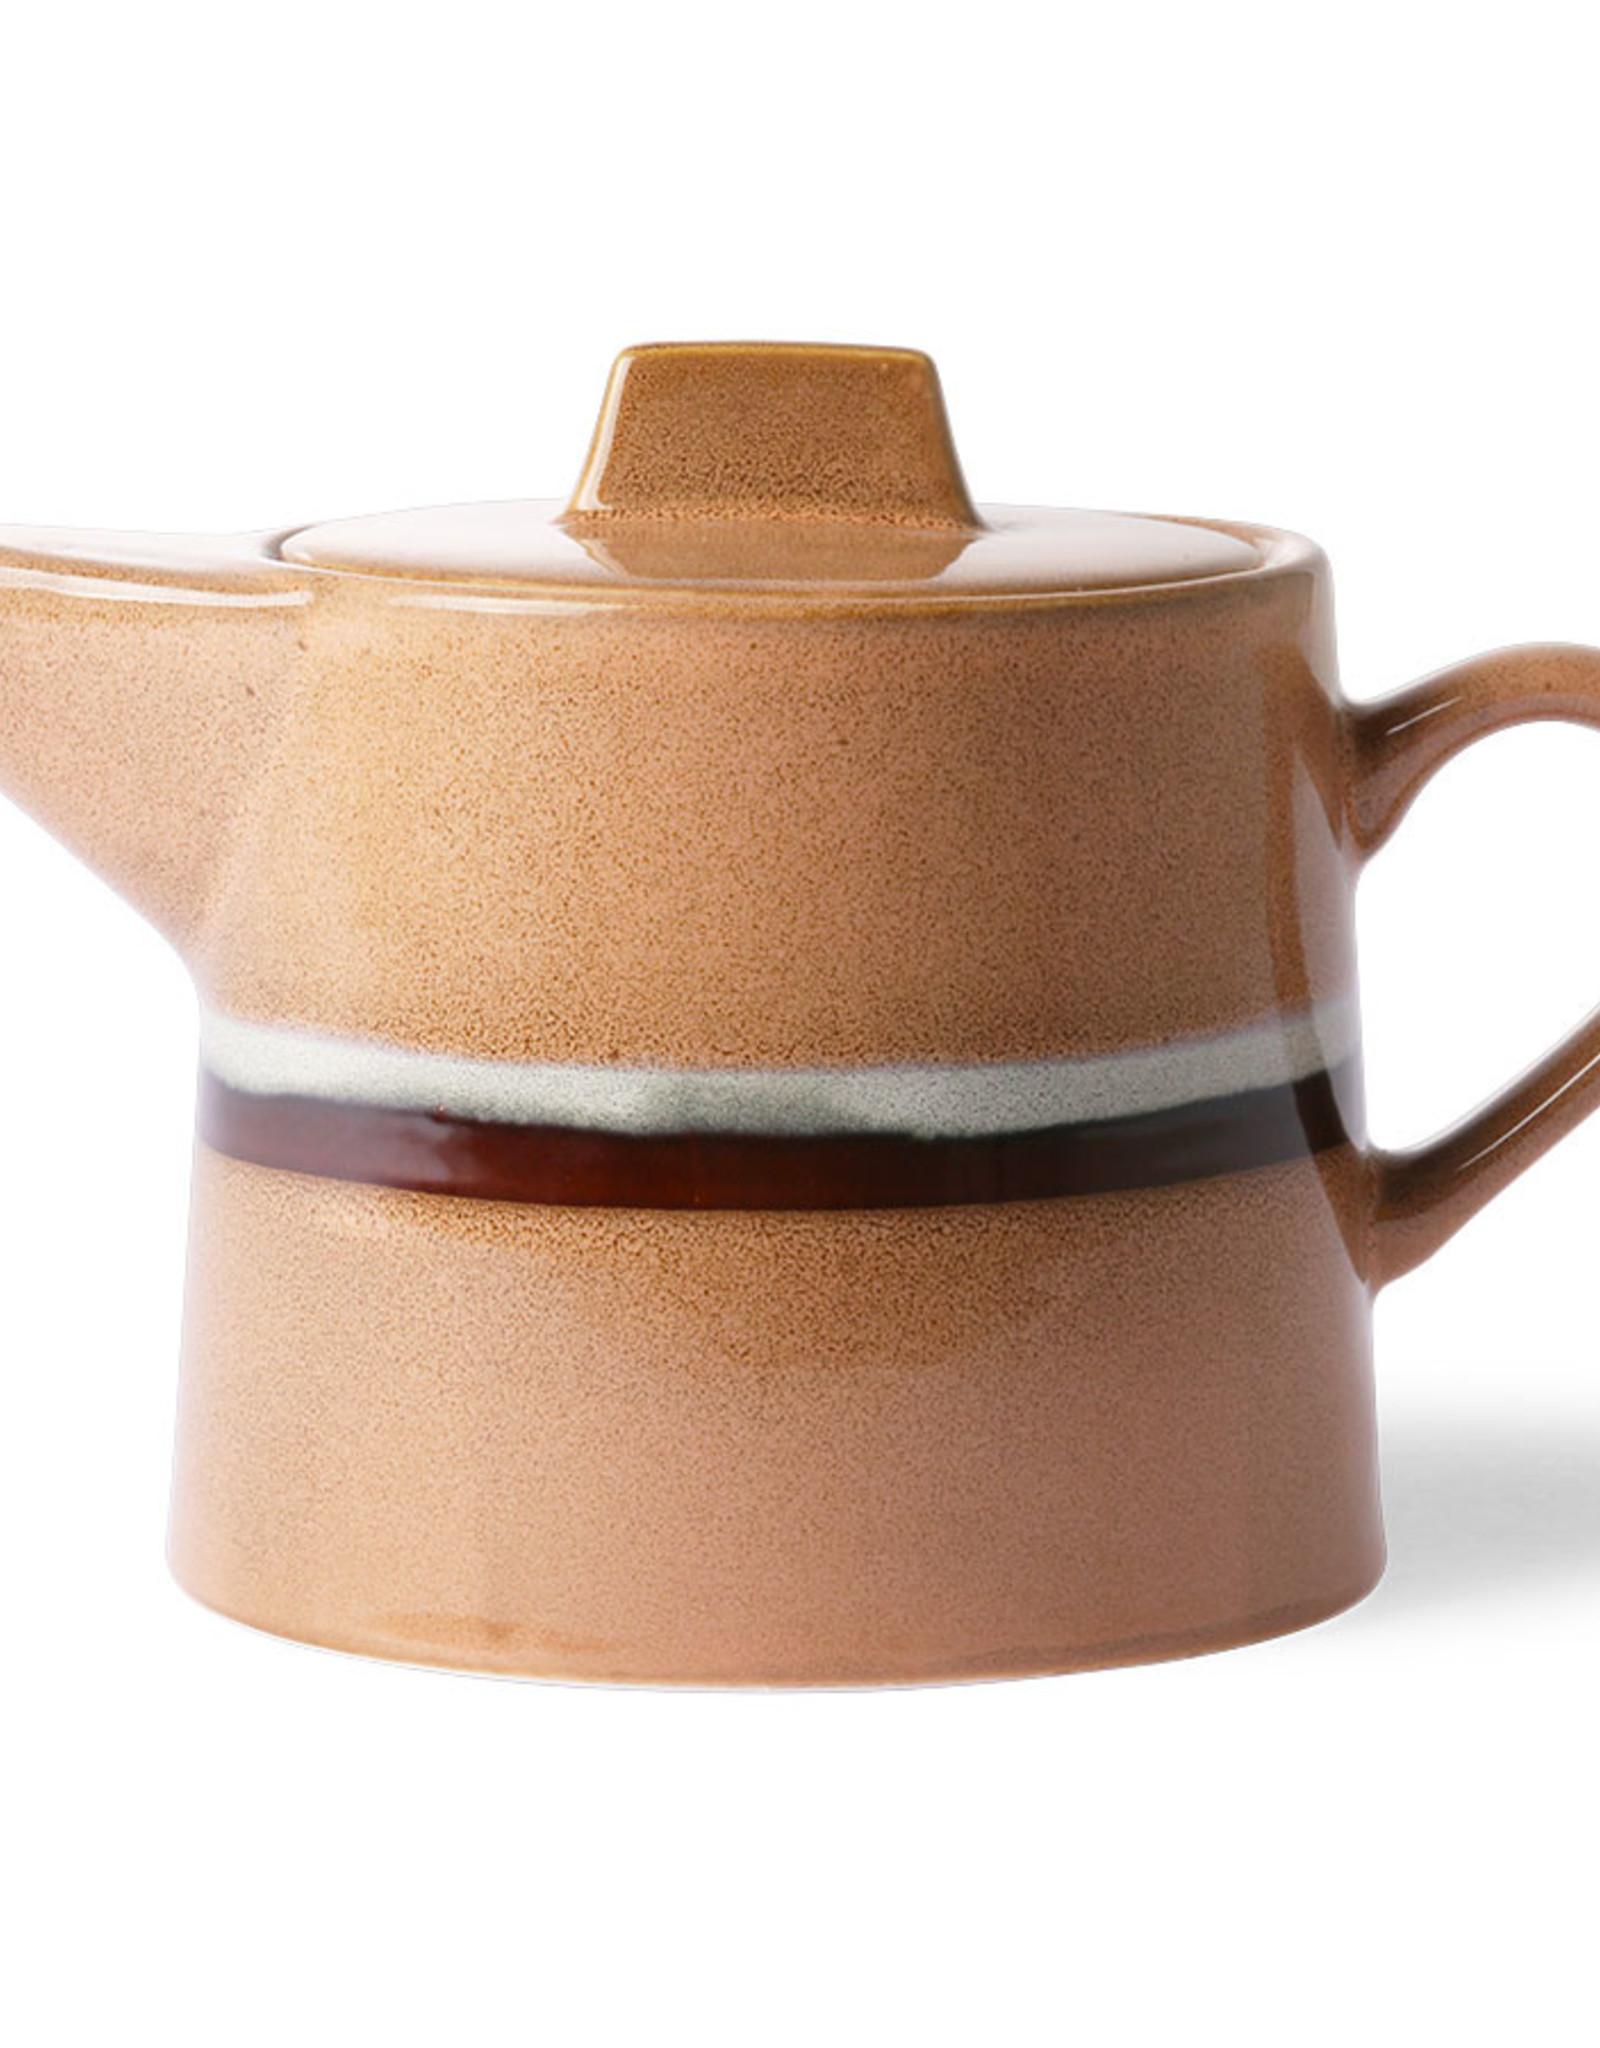 HK living ceramic 70's tea pot: stream